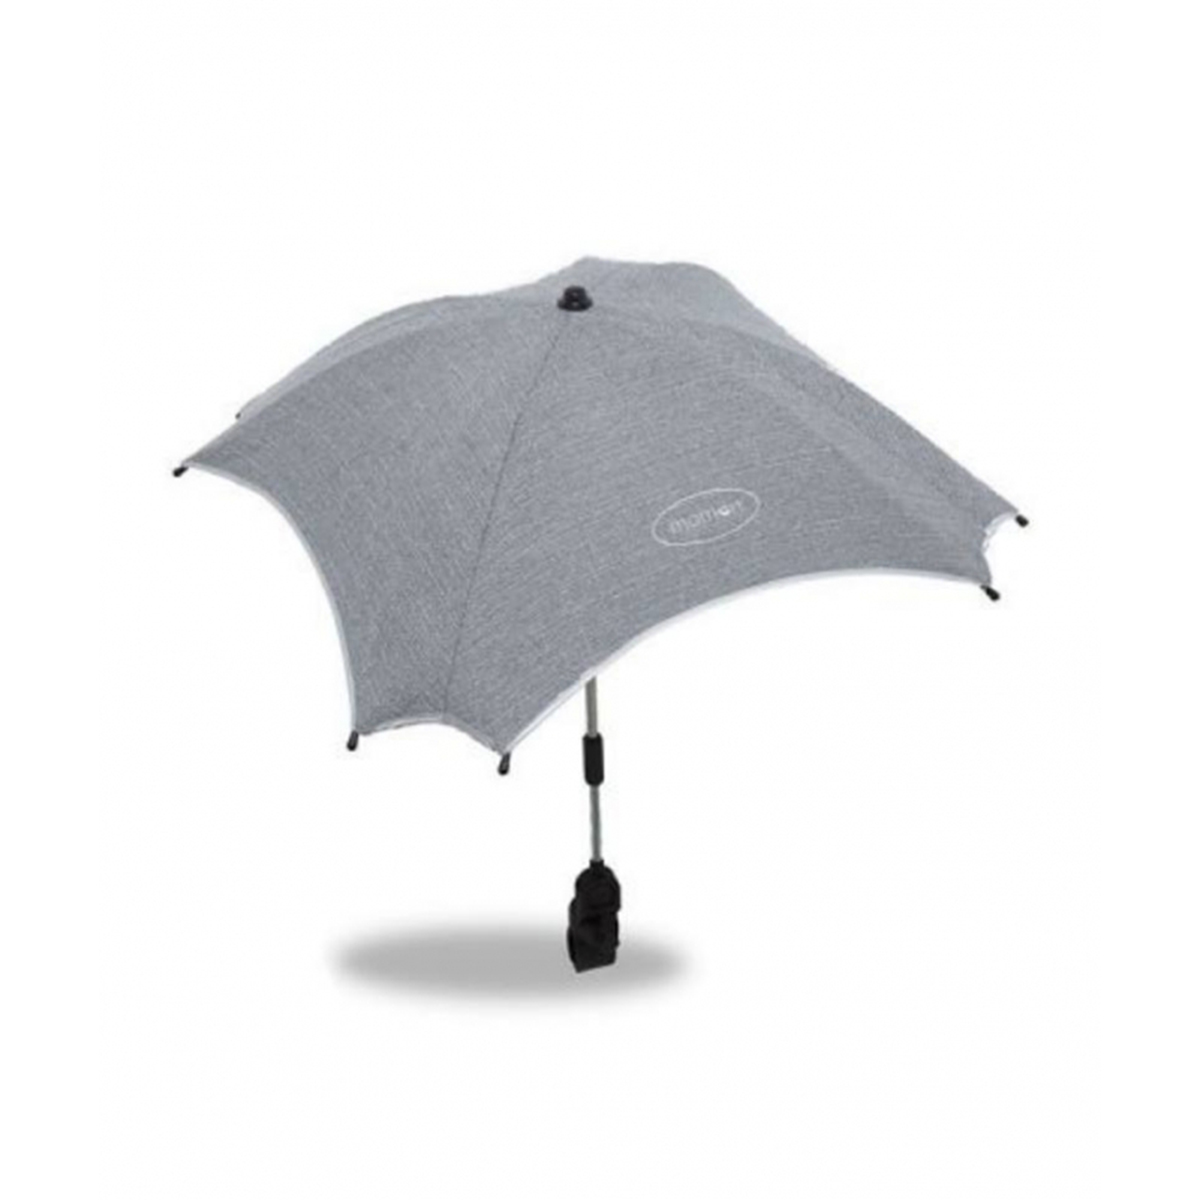 Parapluie Momon After 53 - Royce Gray